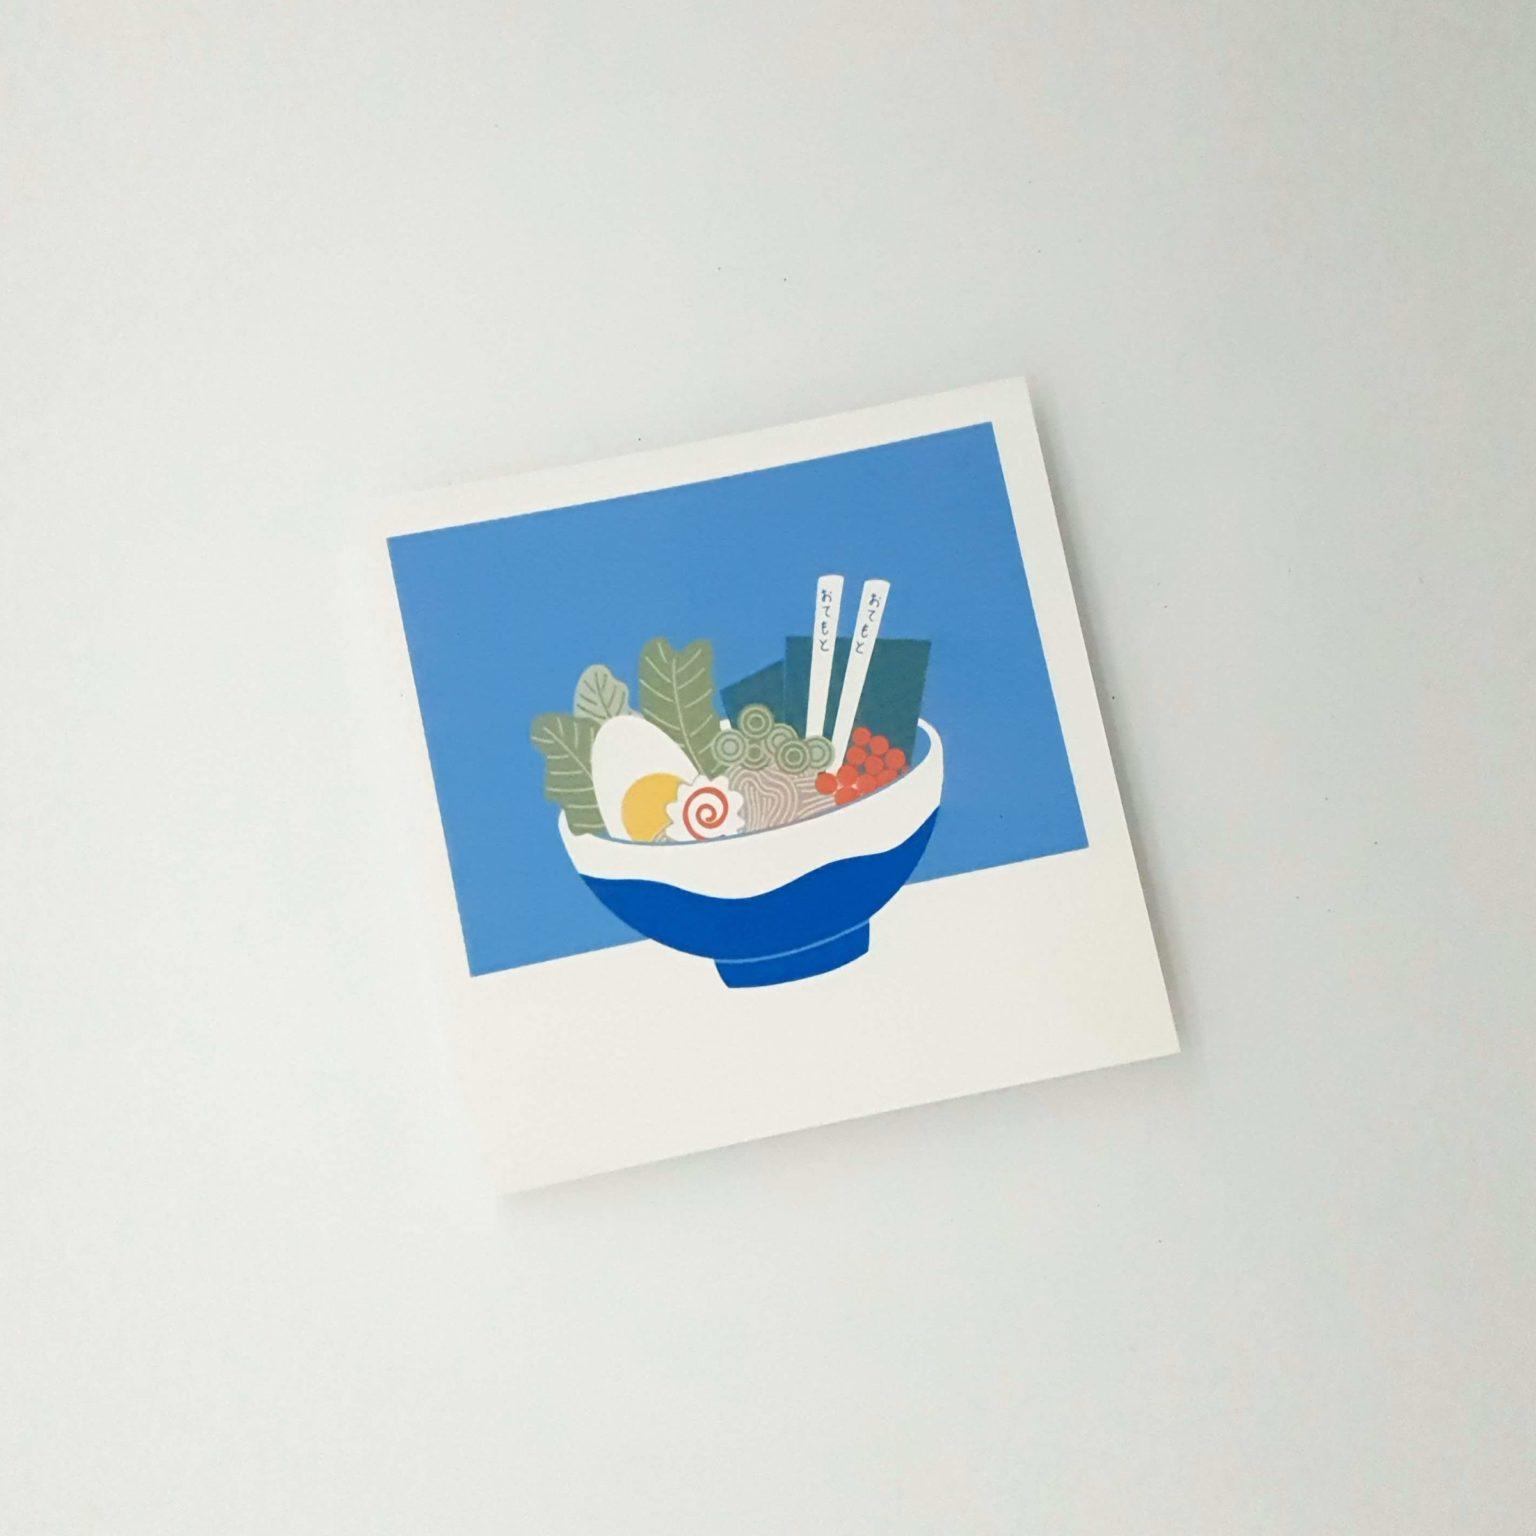 Ramen_Tang_Mian_Illustration_Postcard_vorne